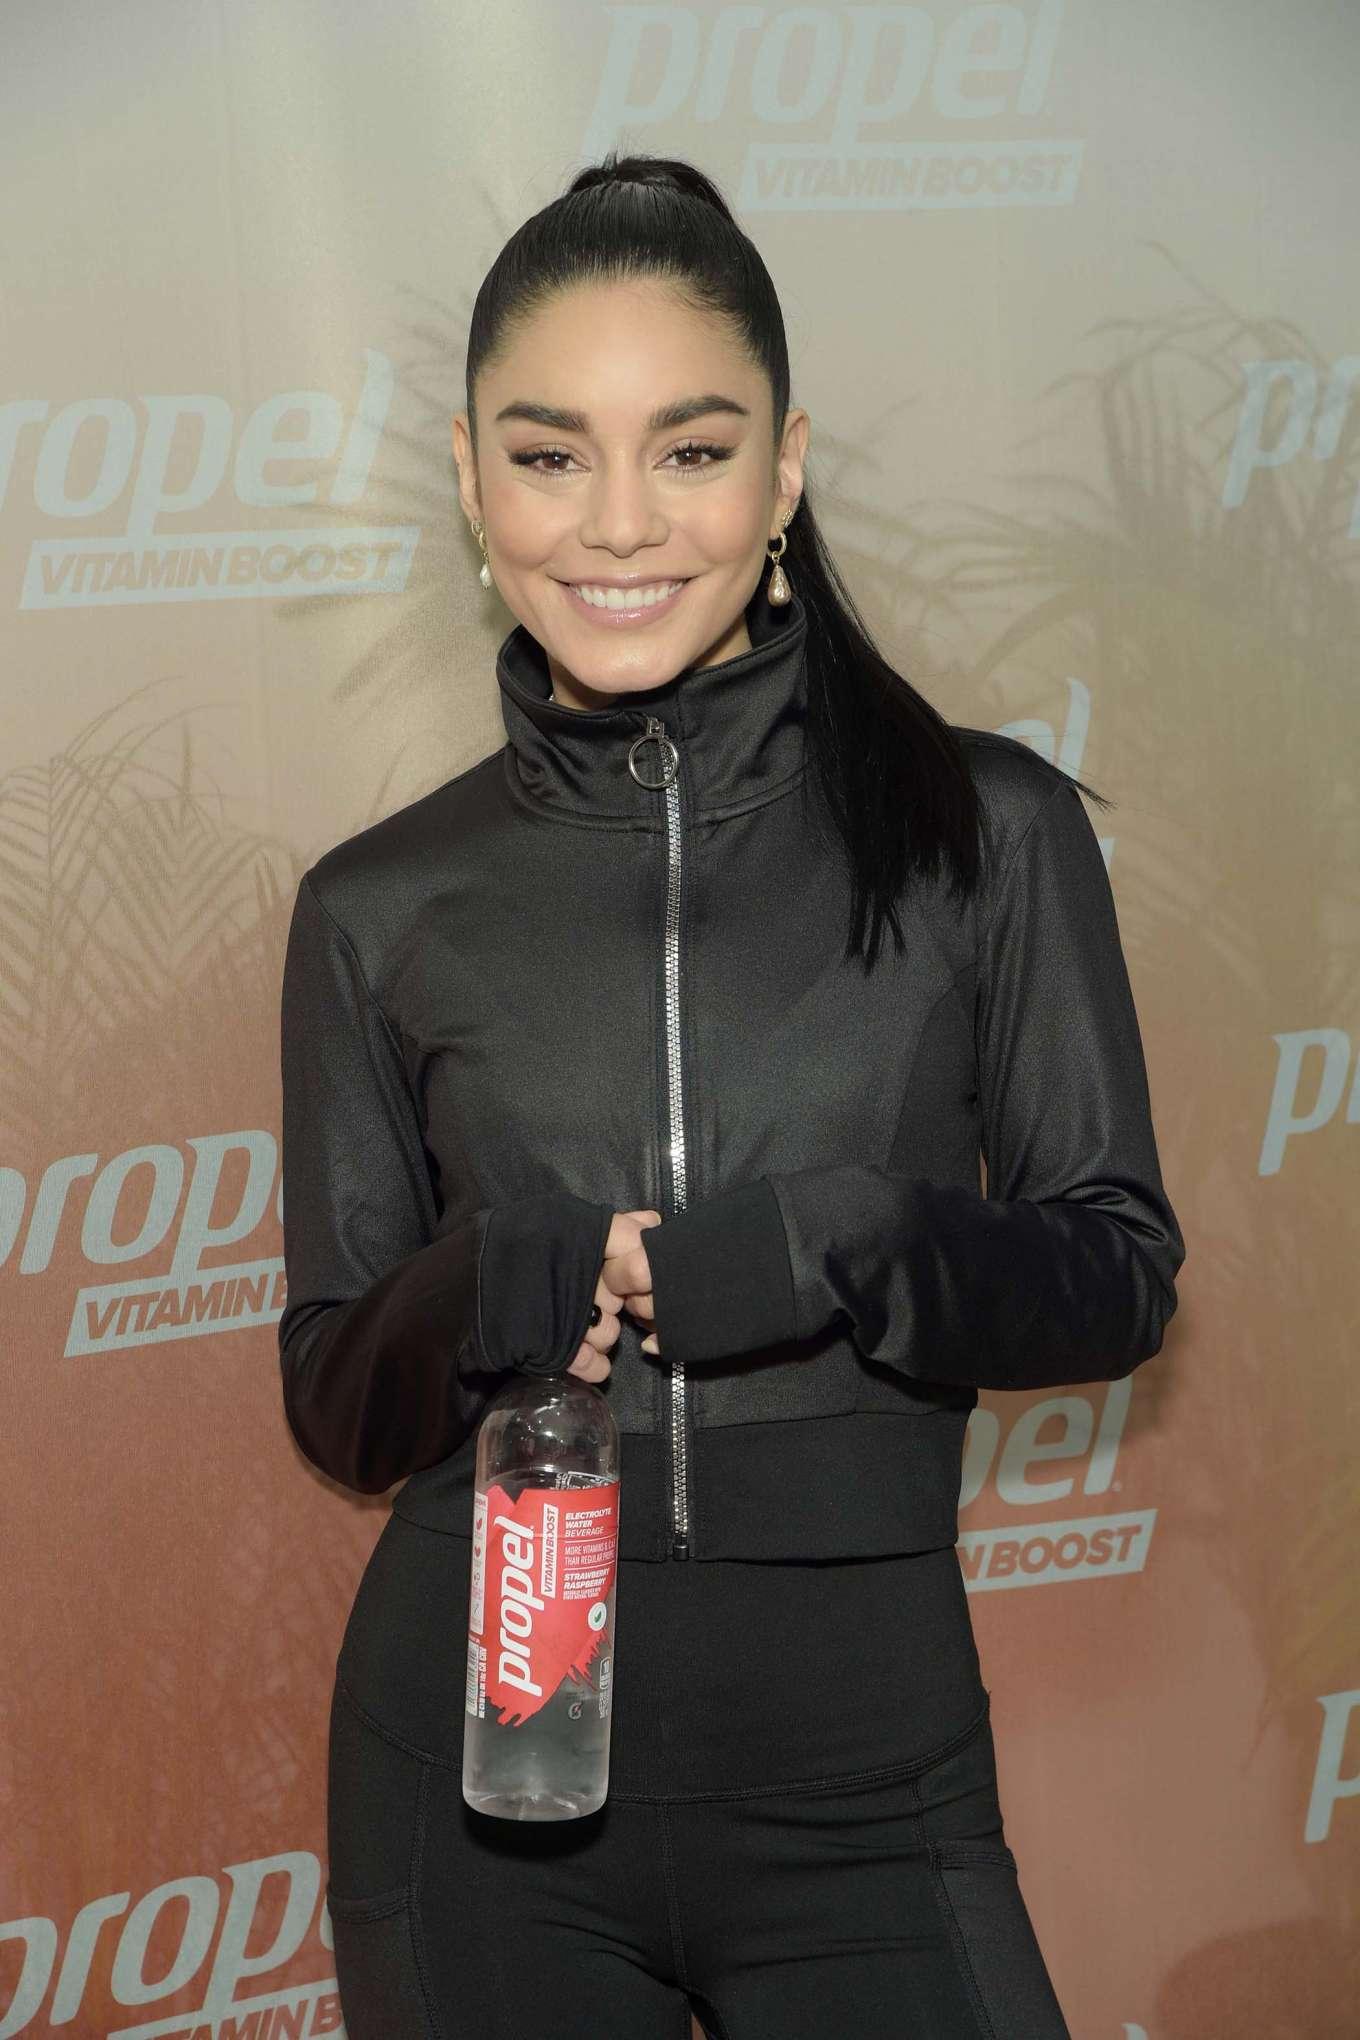 Vanessa Hudgens 2019 : Vanessa Hudgens: Works out with Propel Vitamin Boost -18